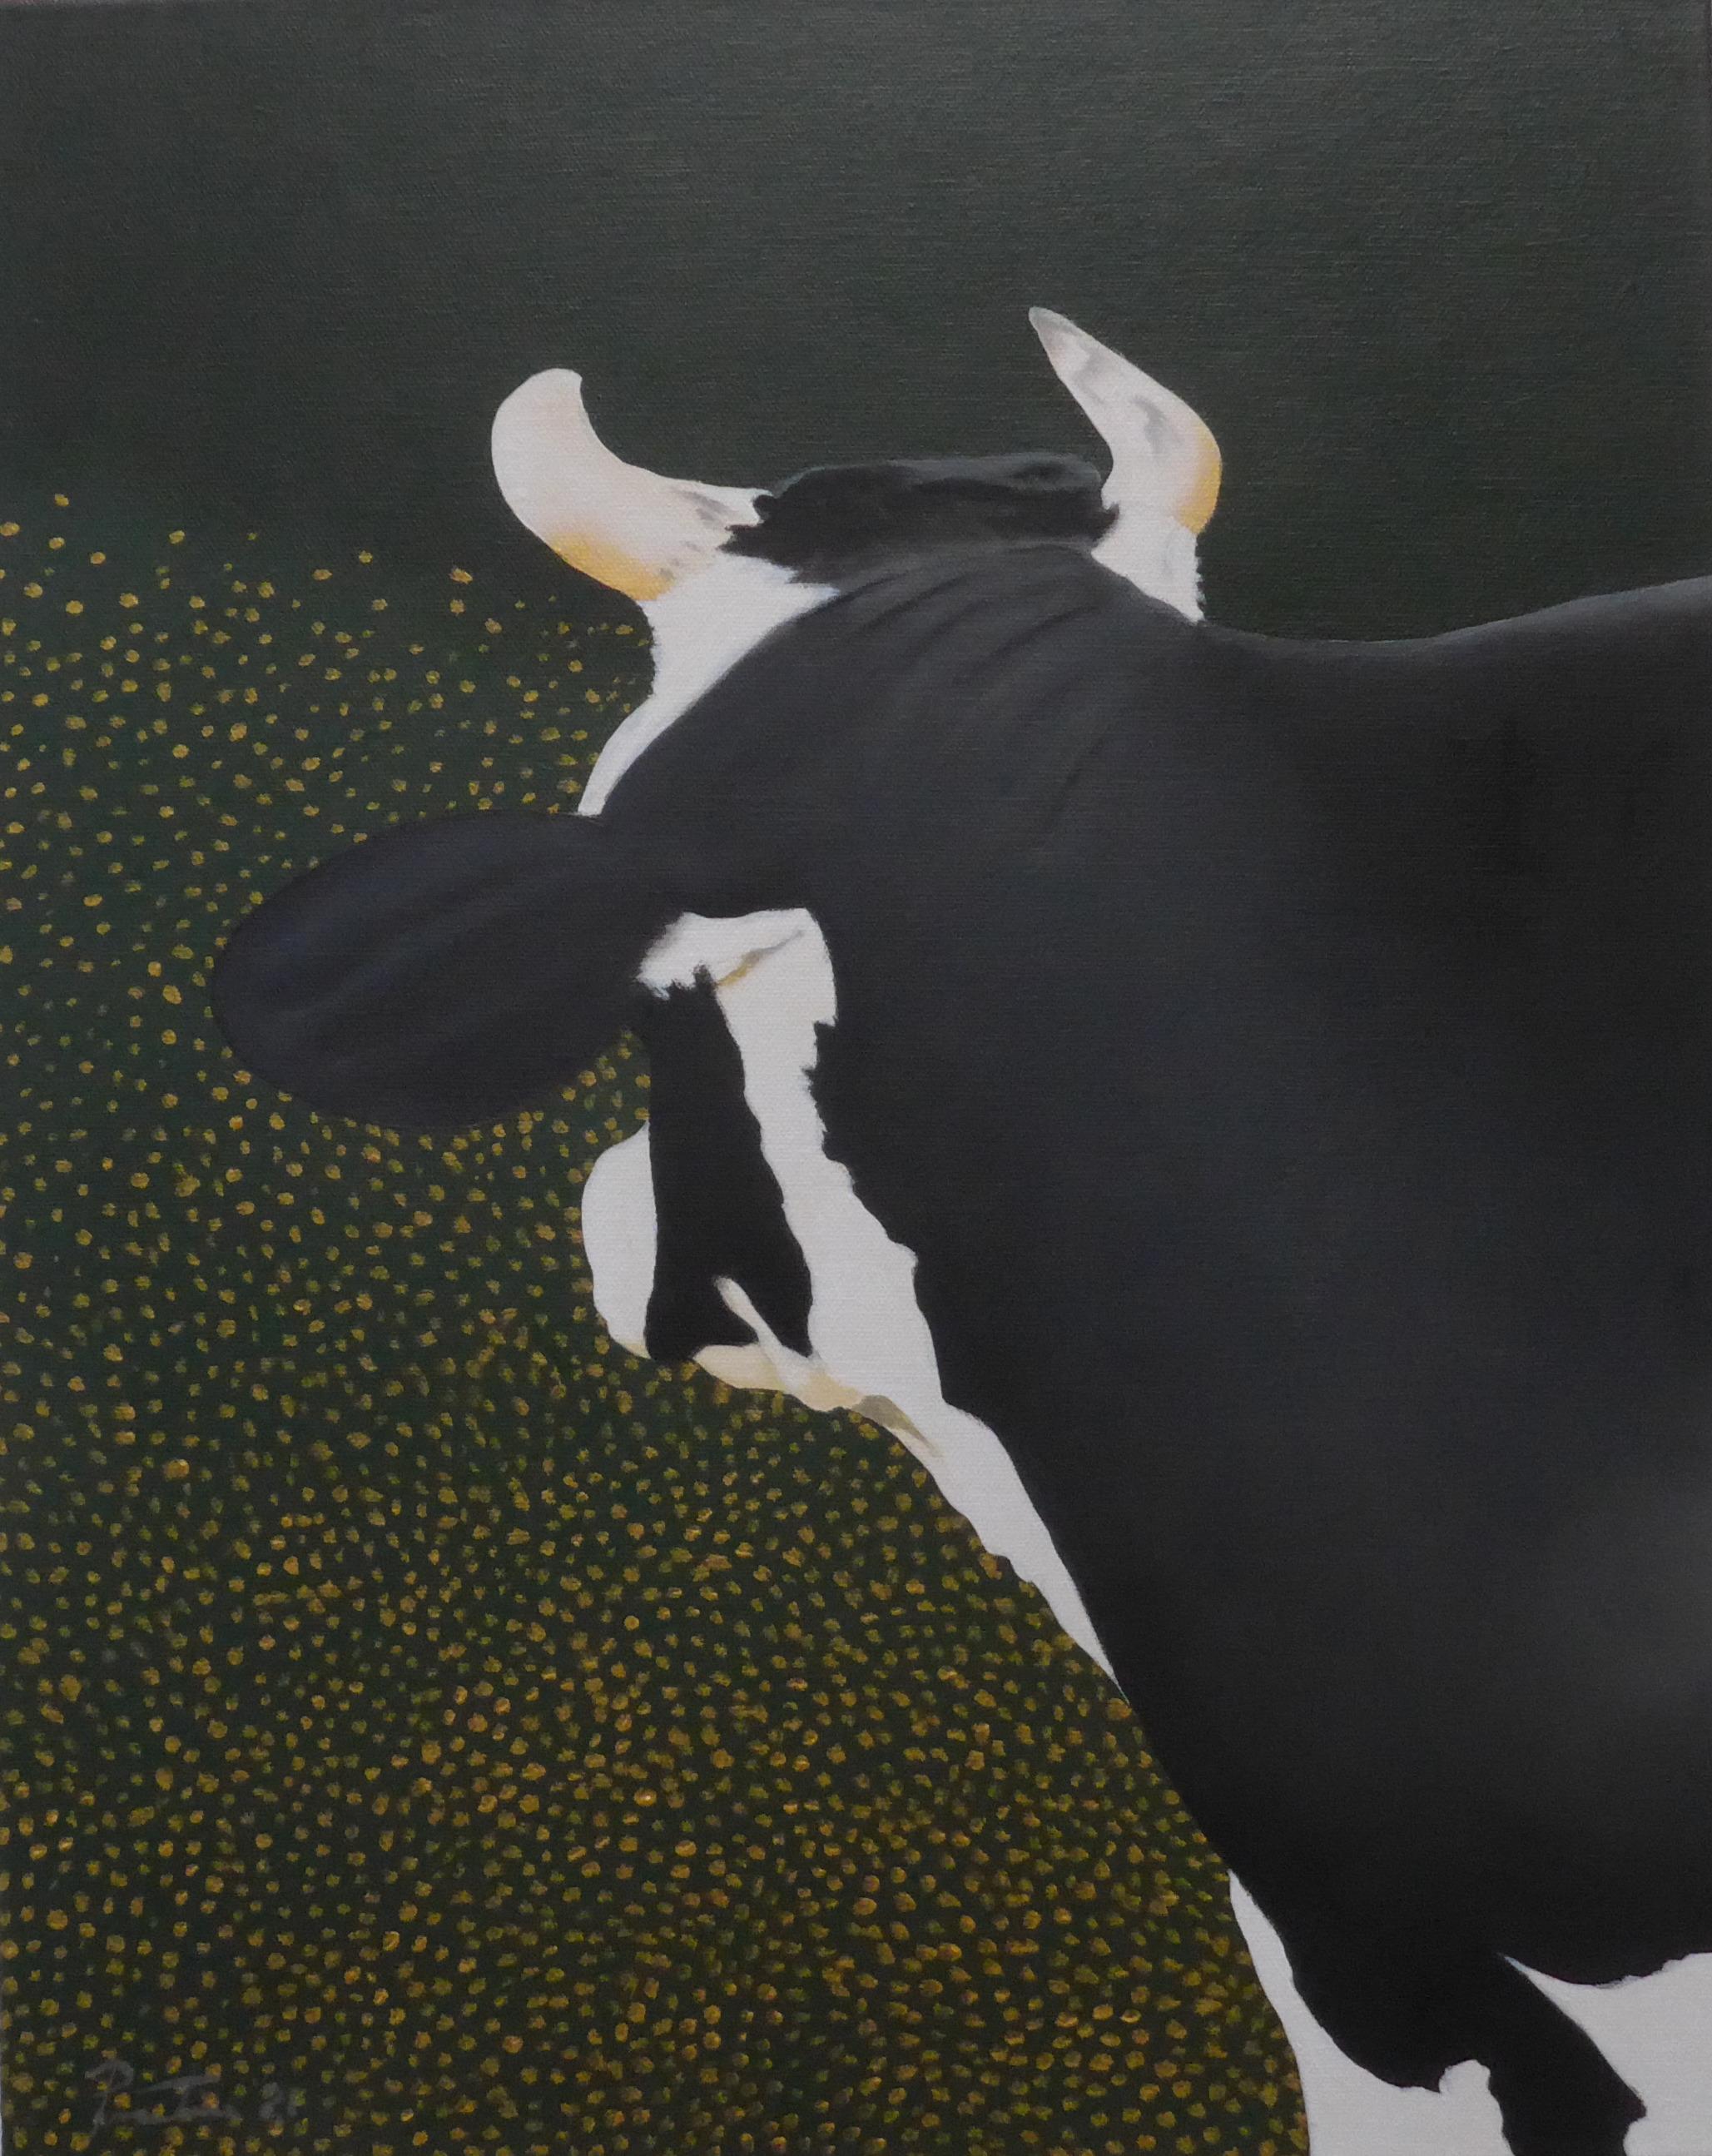 La volie vache ix hla303